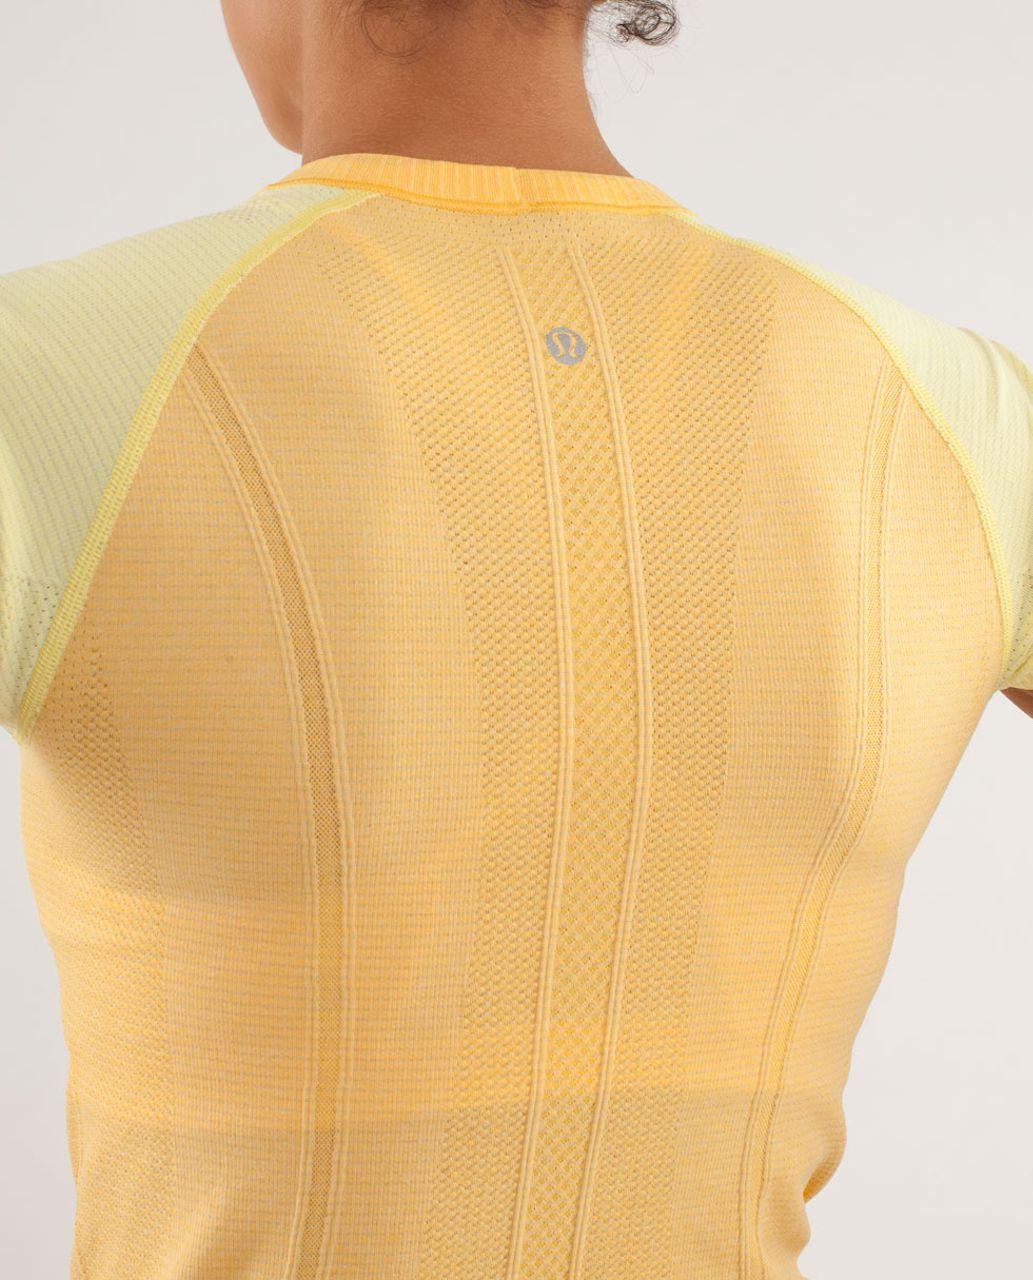 Lululemon Run:  Swiftly Tech Short Sleeve - Burning Yellow / Mellow Lemon